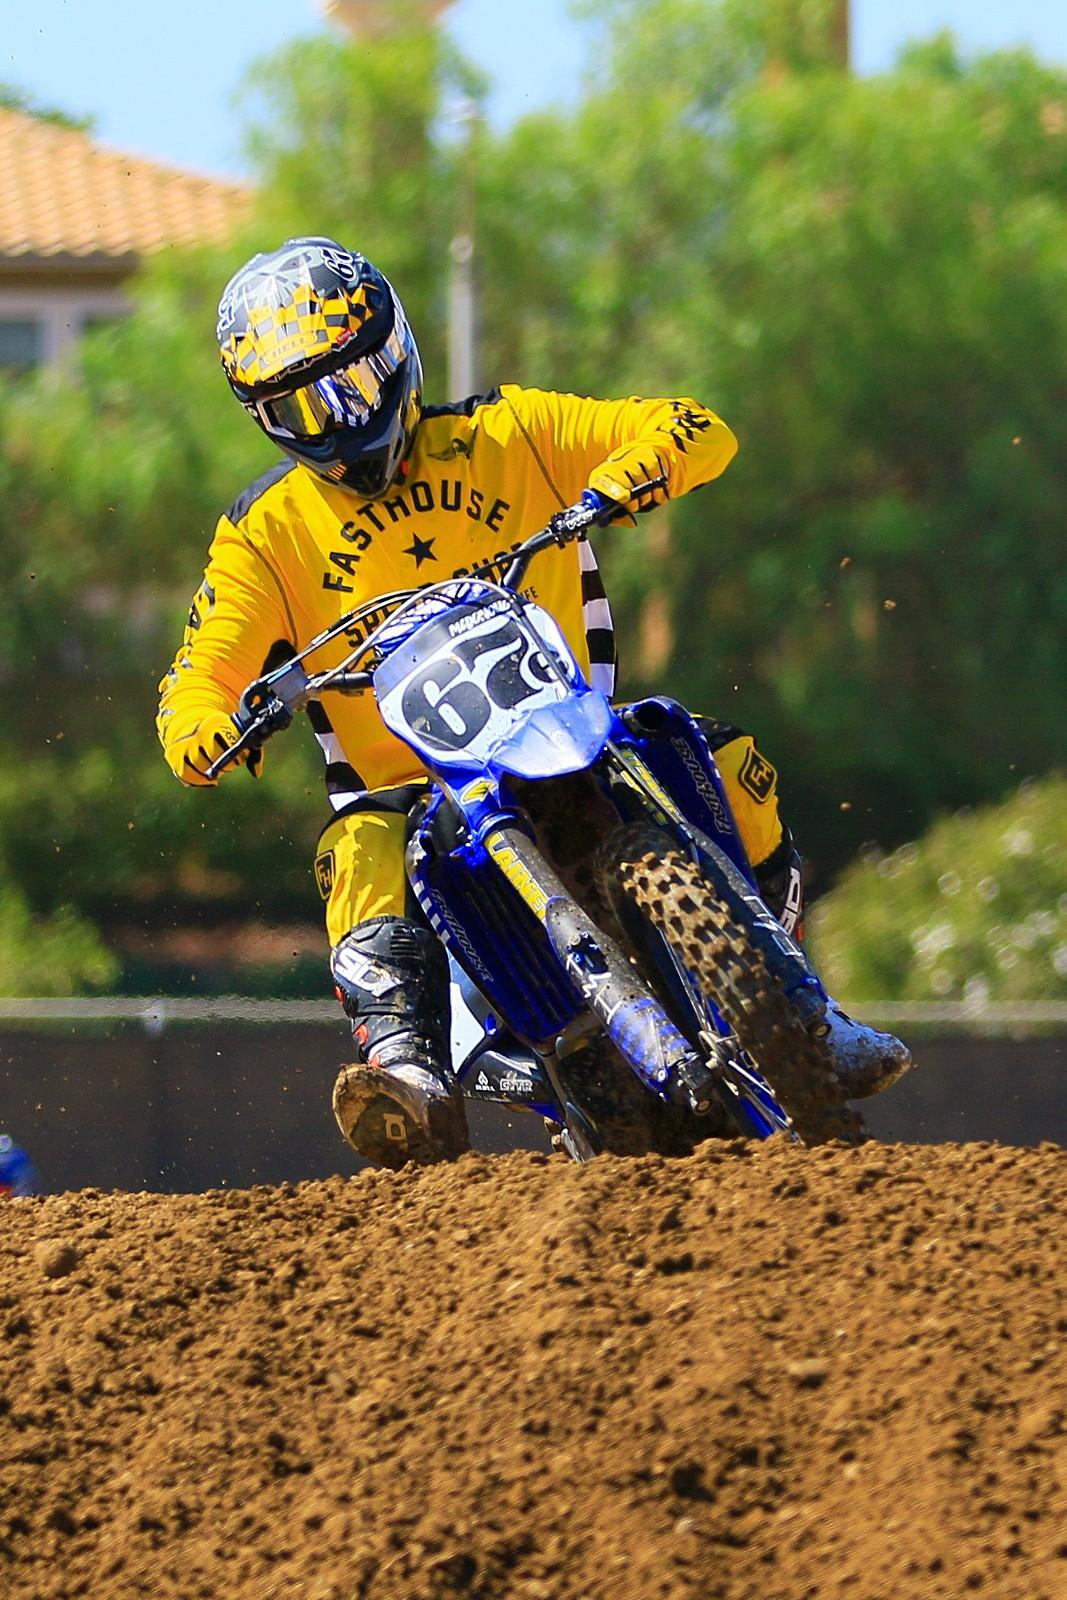 050A4927 - moto67e - Motocross Pictures - Vital MX